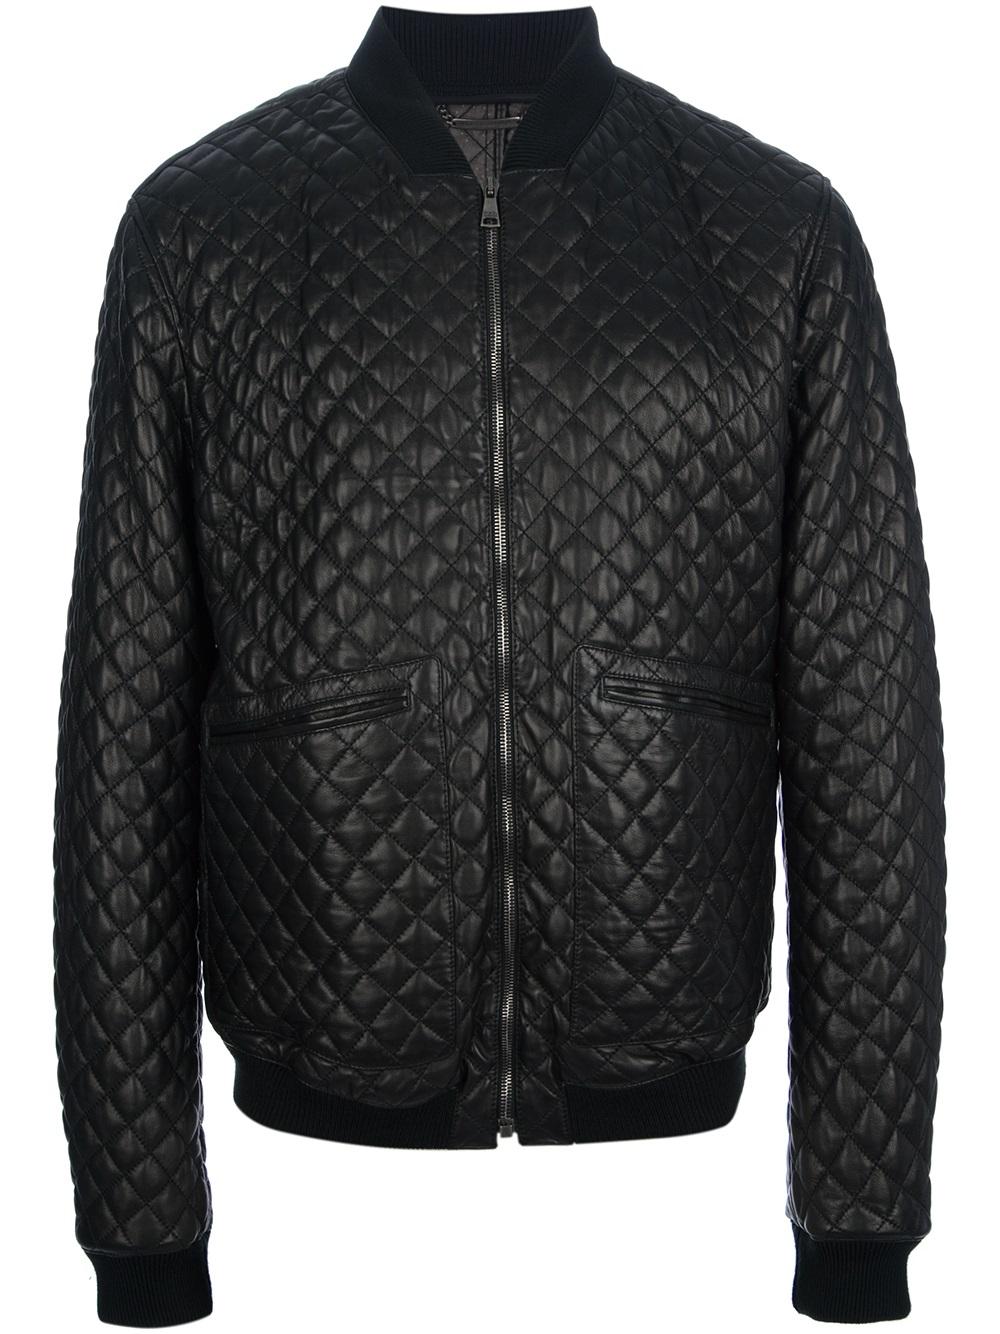 Lyst Dolce Amp Gabbana Quilted Bomber Jacket In Black For Men